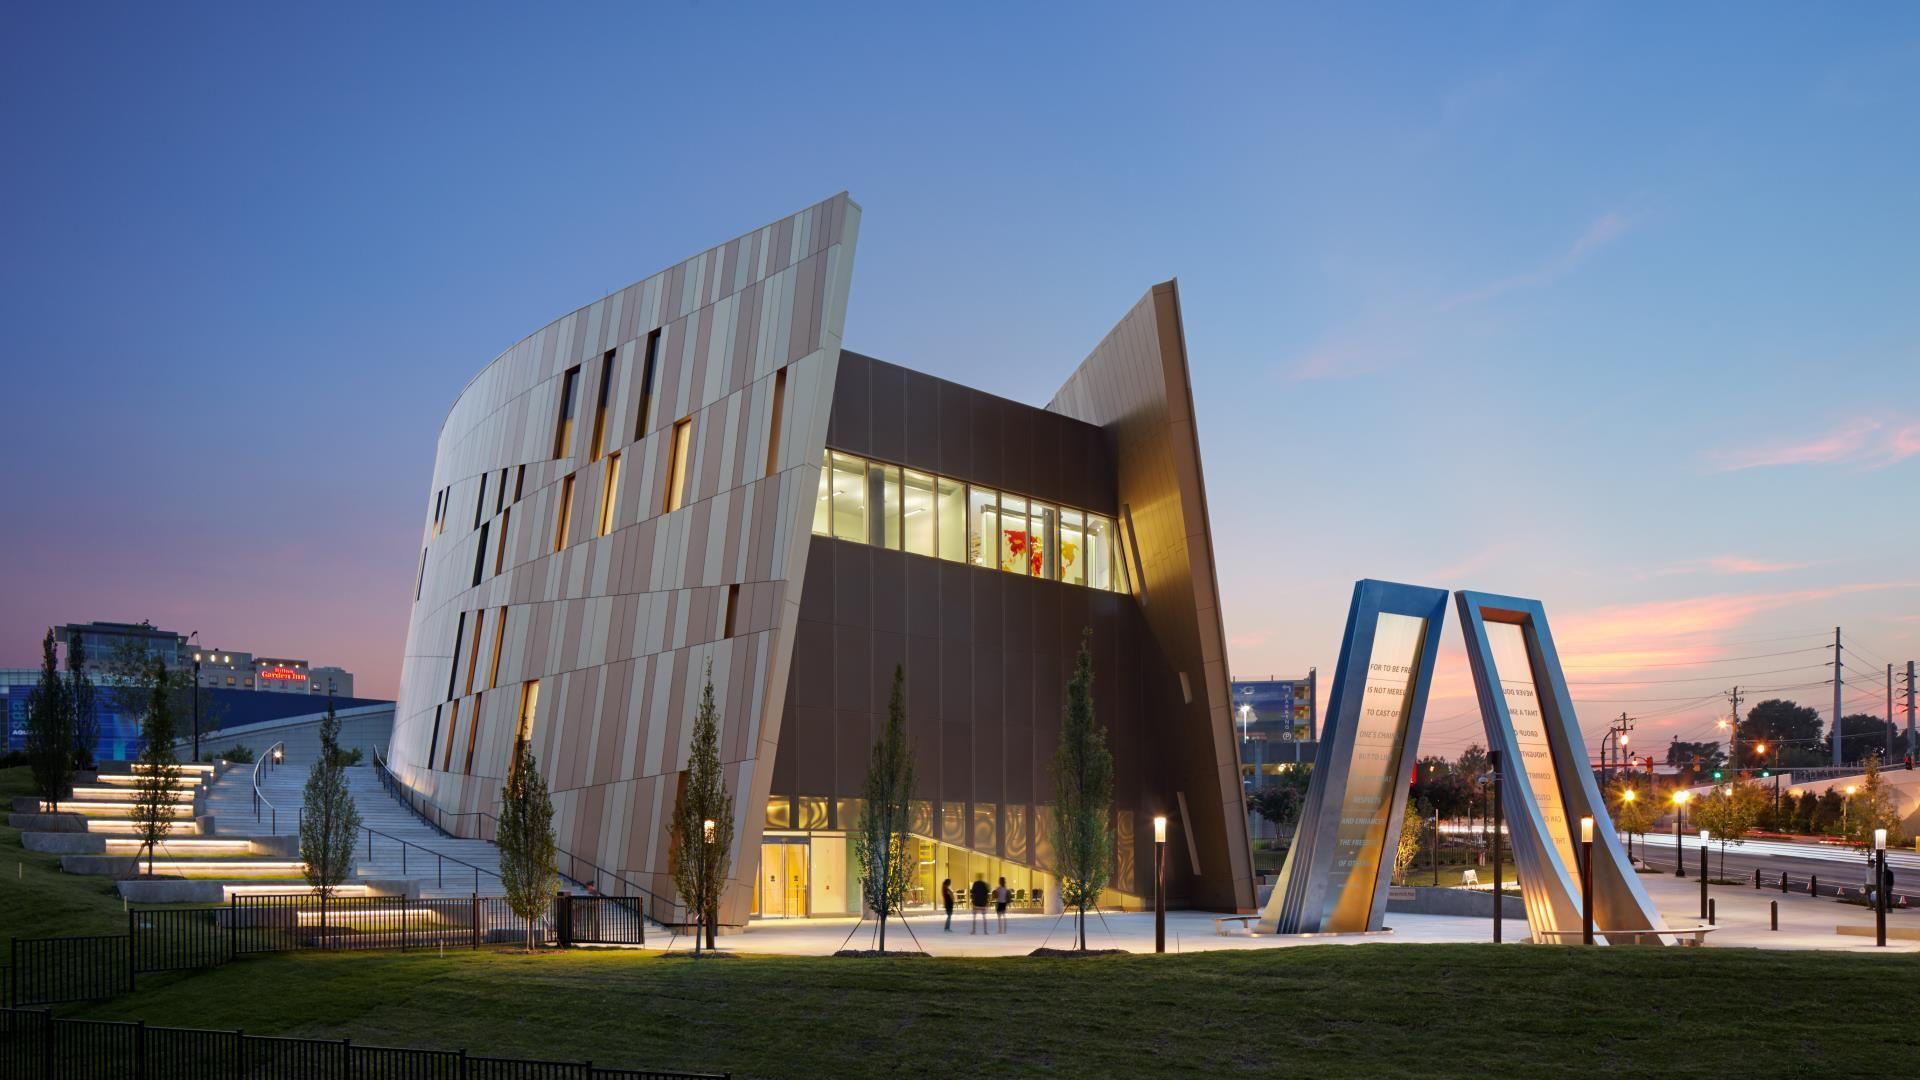 National Center For Civil And Human Rights Atlanta Georgia Architect Civil Rights Museum Civilization